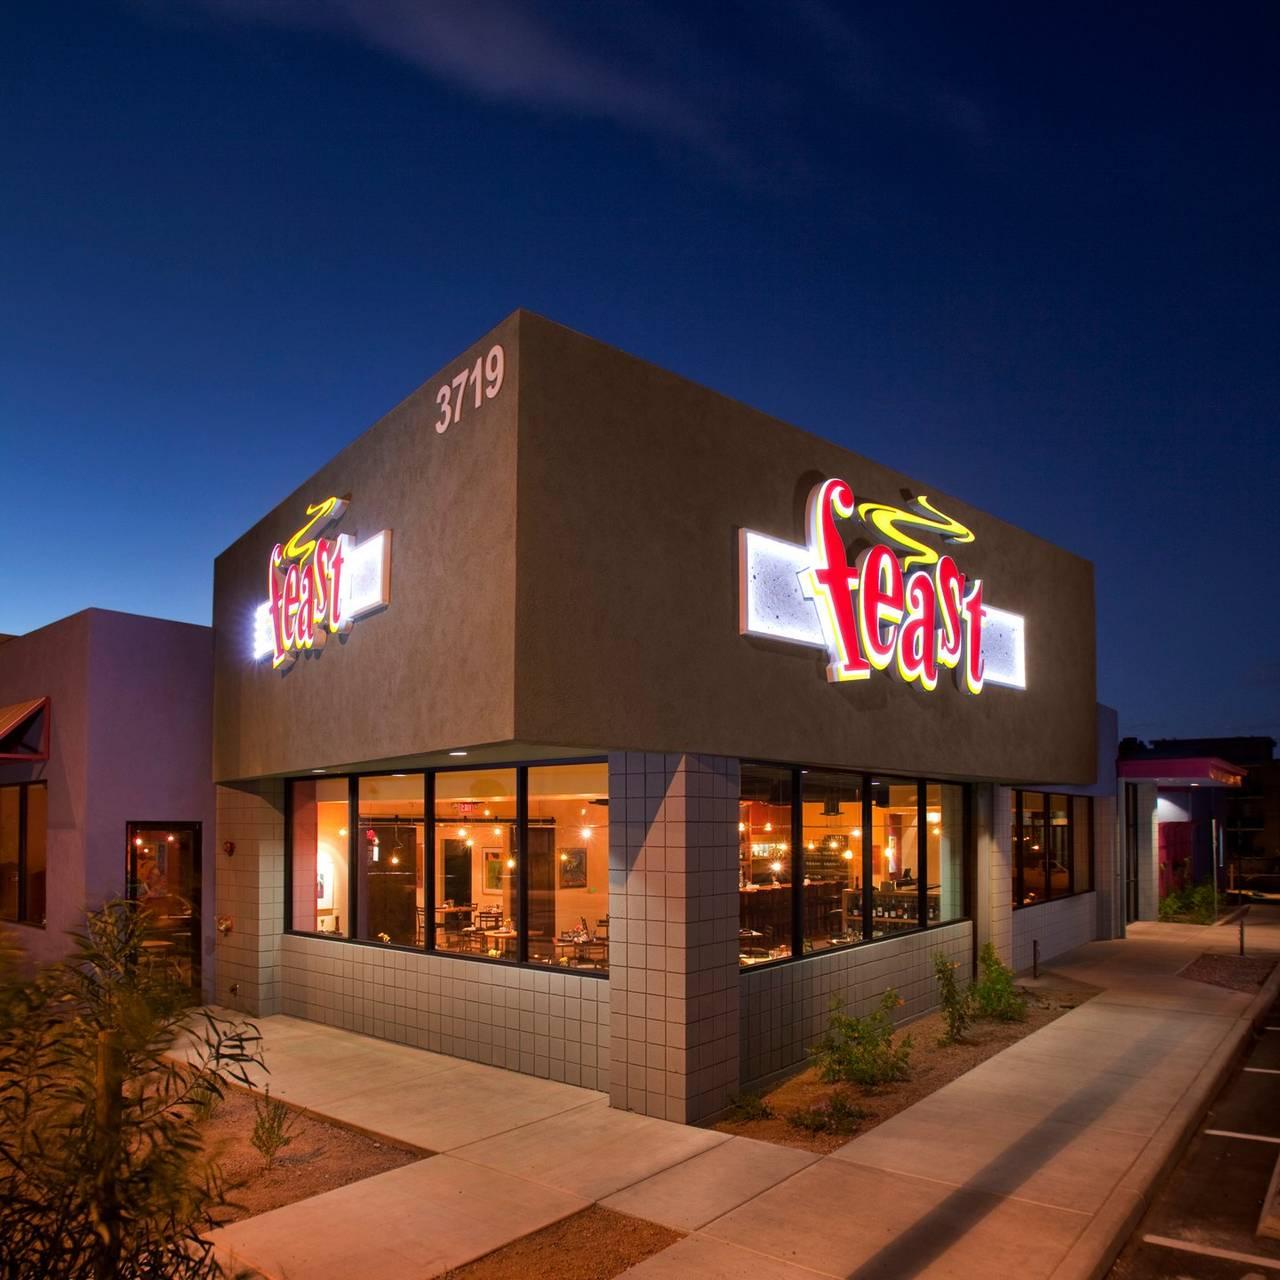 Feast Tucson Restaurant Tucson Az Opentable